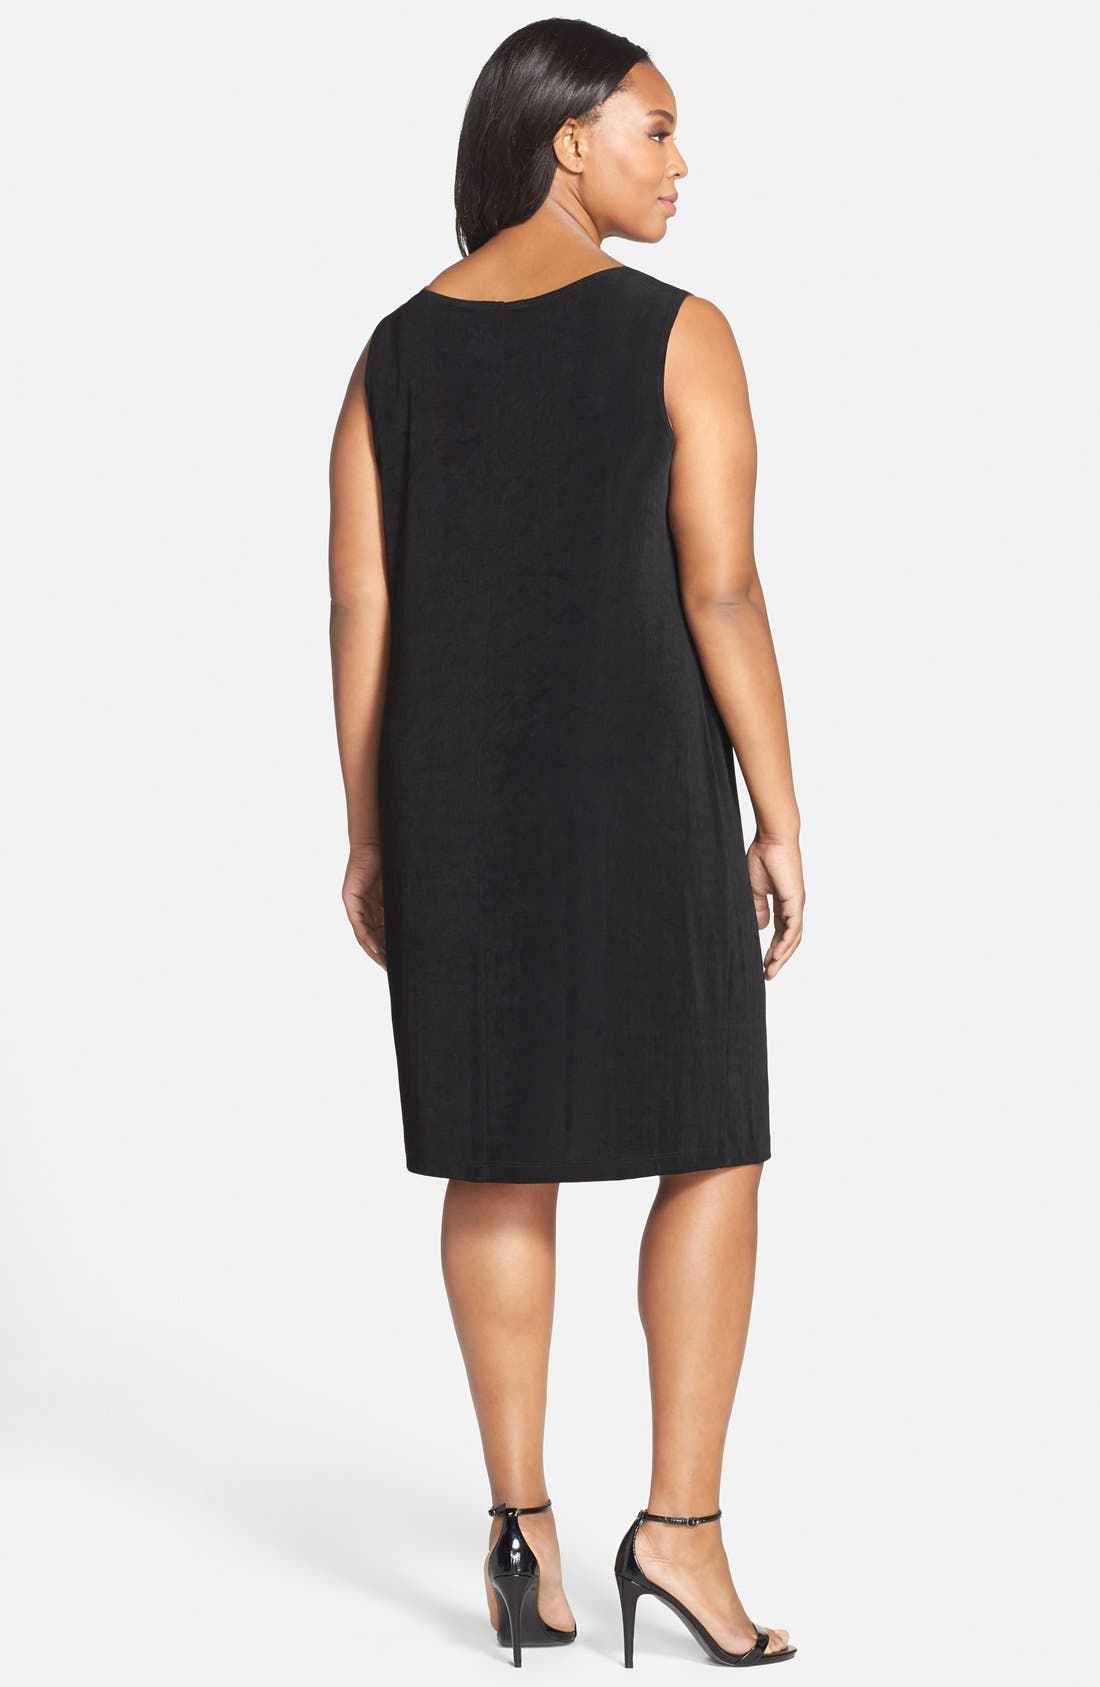 VIKKI VI,                             Sleeveless Shift Dress,                             Alternate thumbnail 7, color,                             BLACK